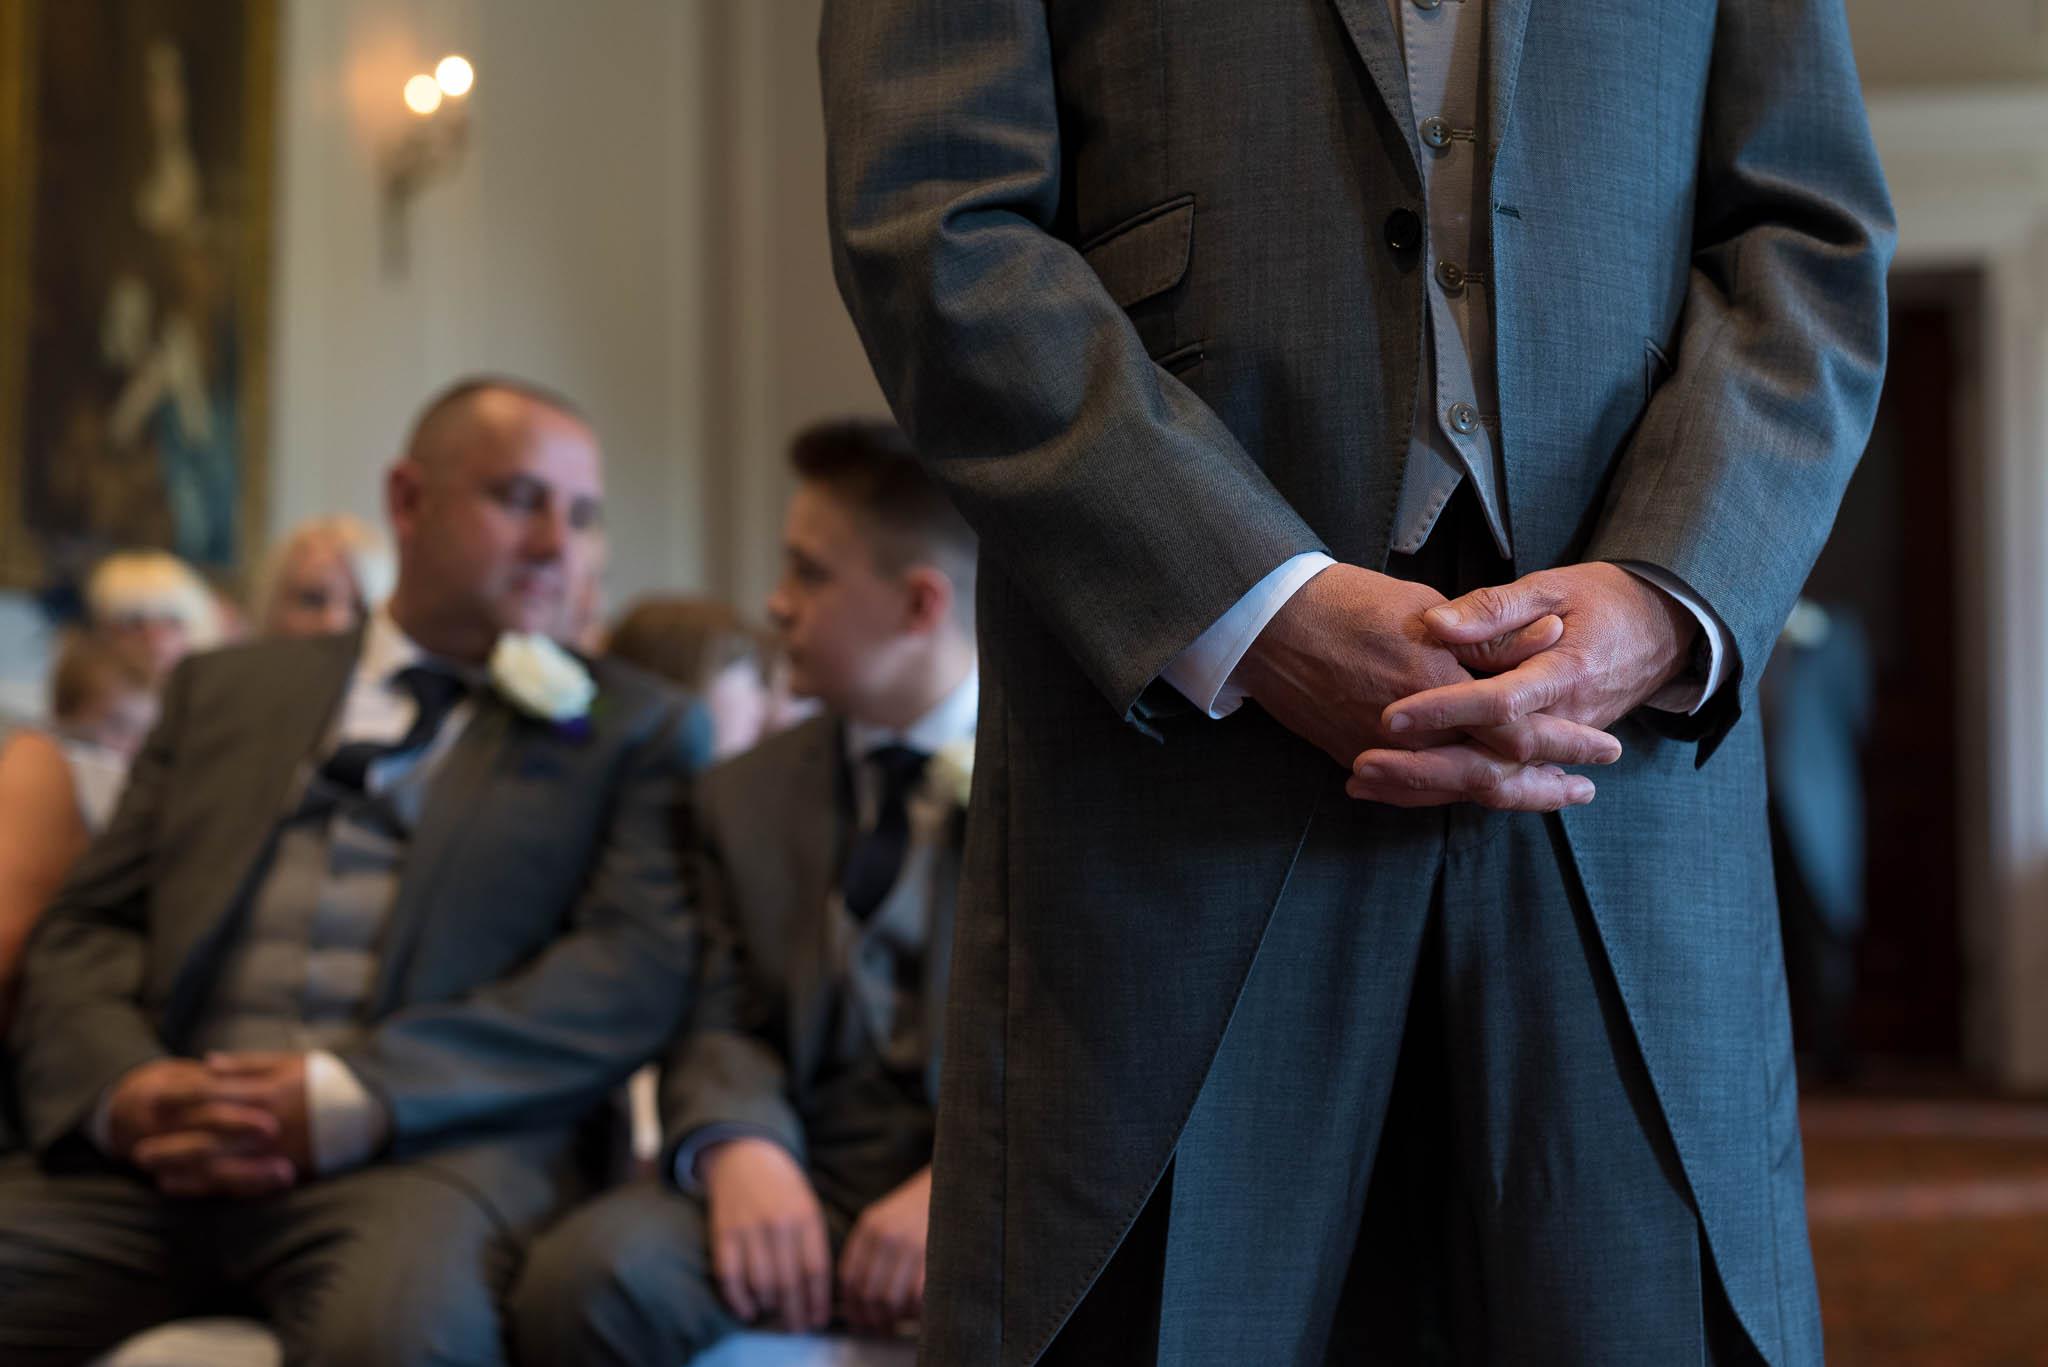 Crathorne Hall Hotel Wedding Photographer49.jpg